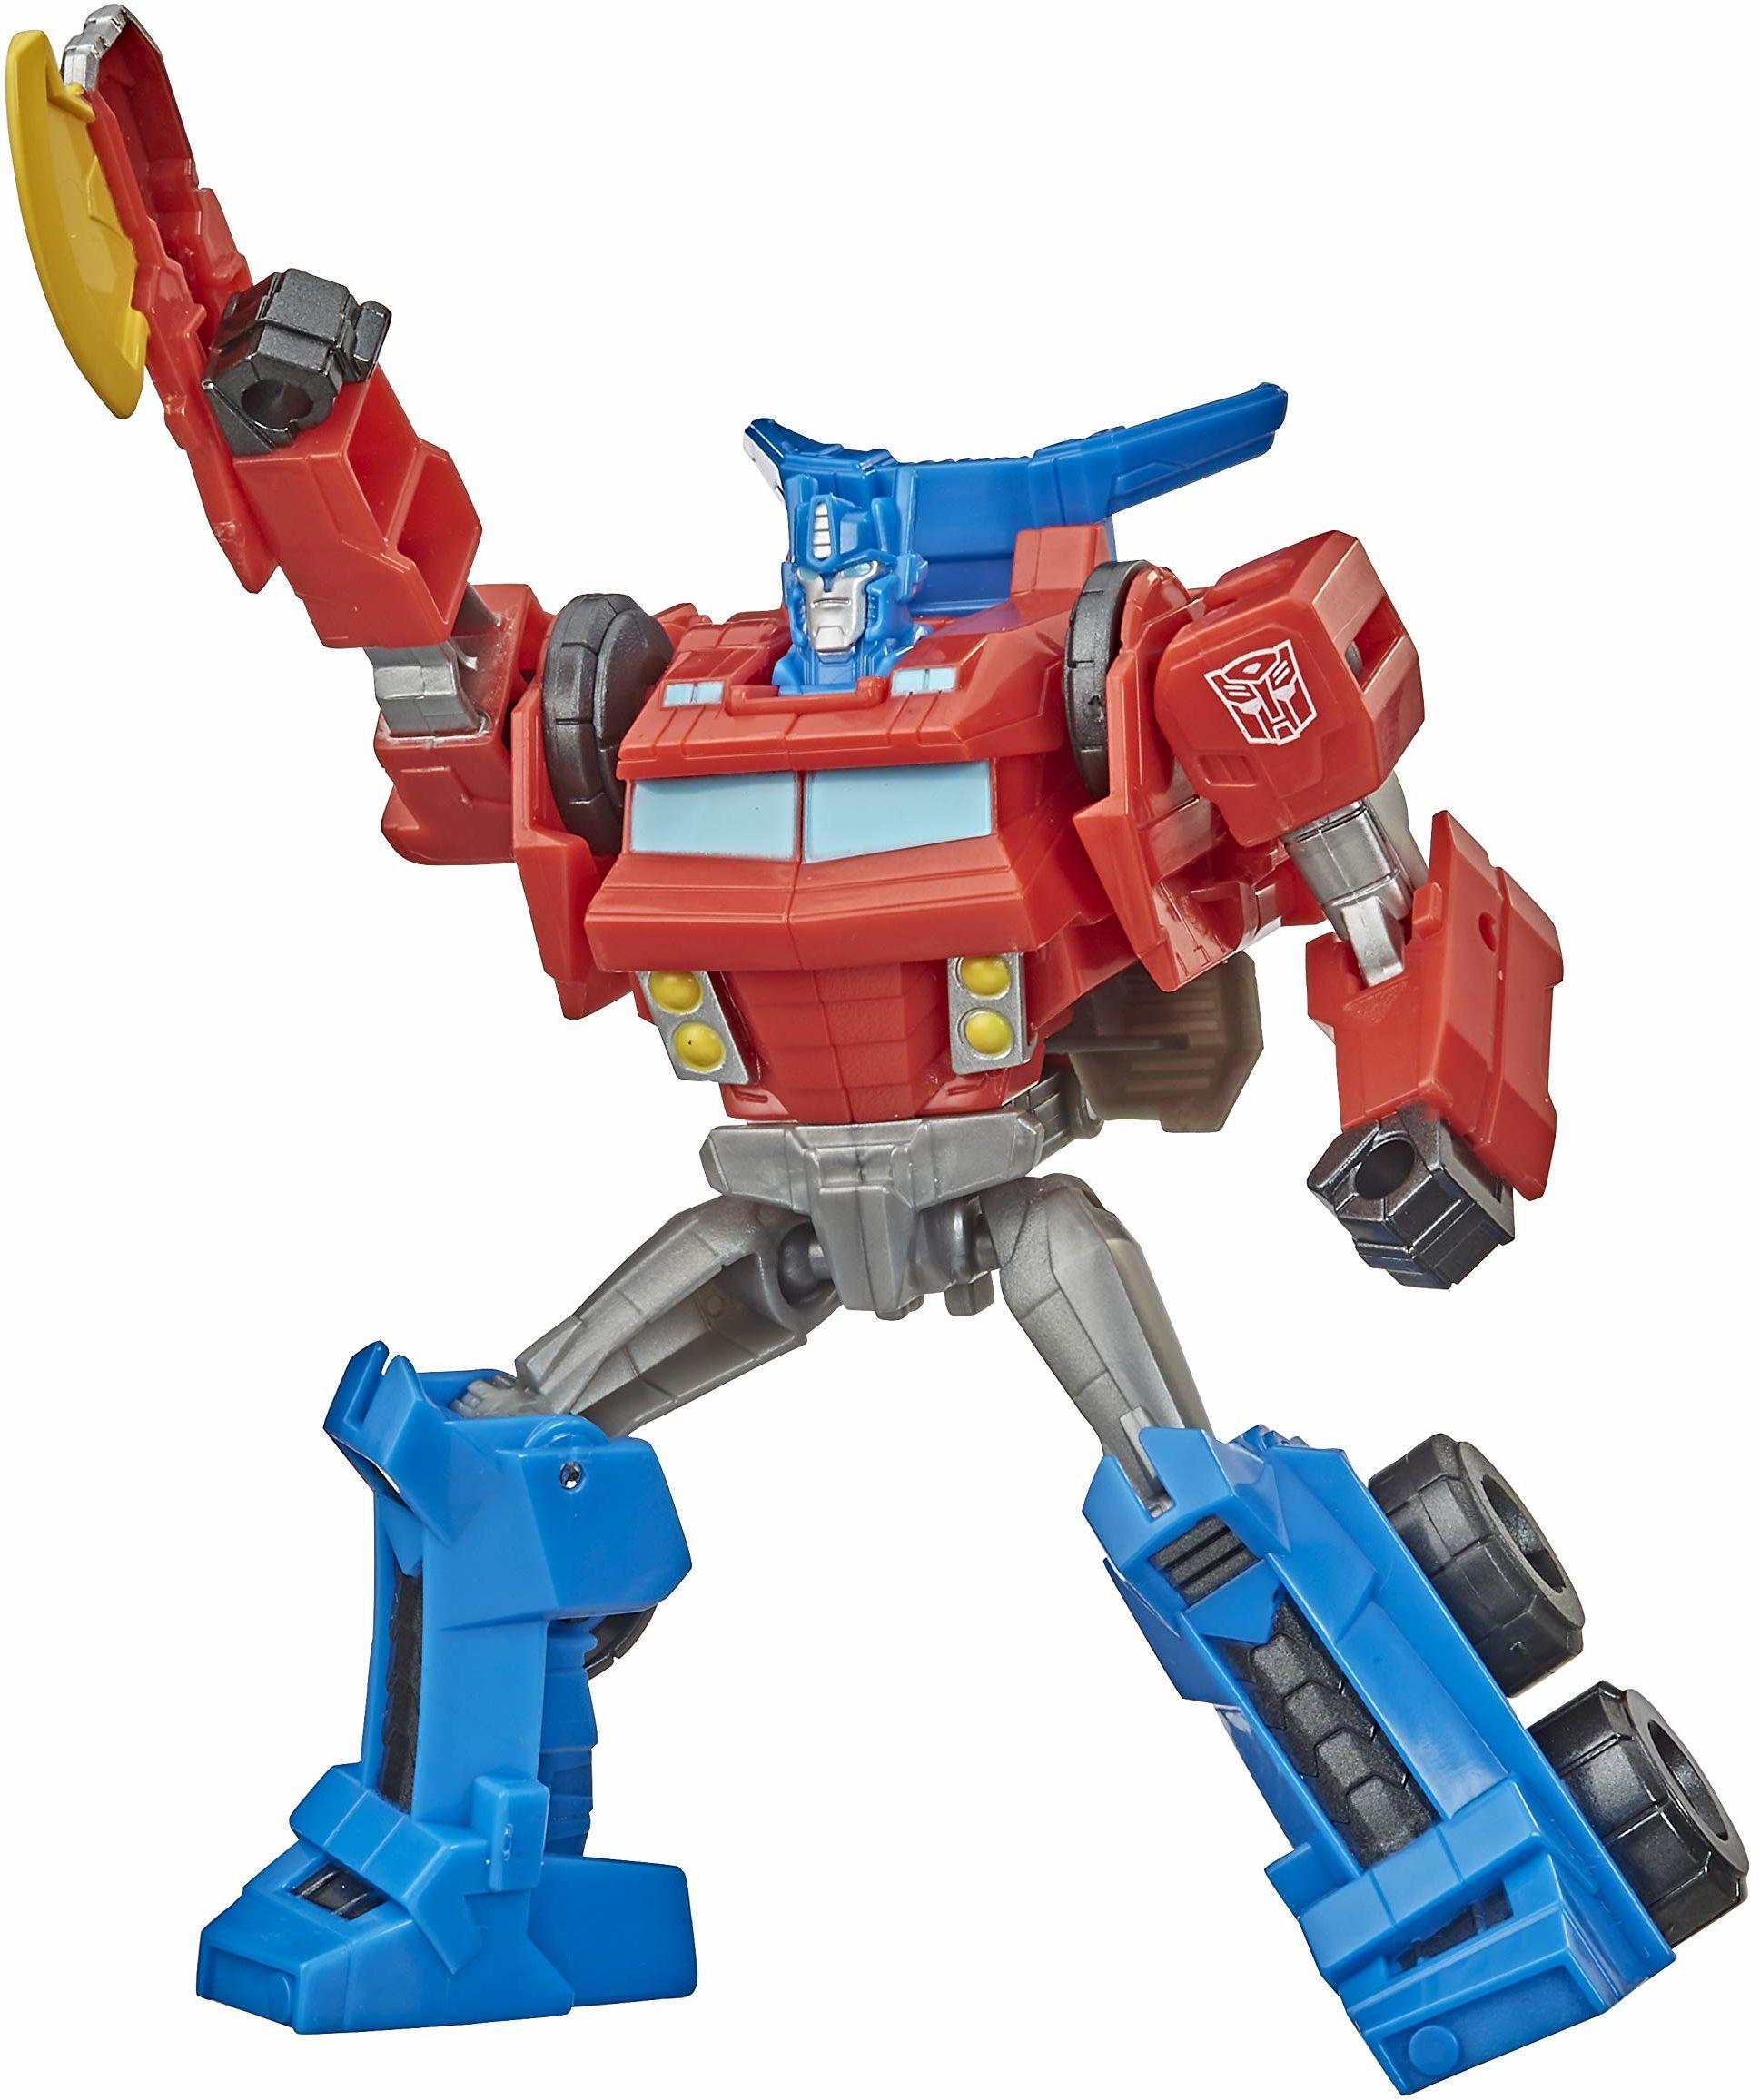 Transformers Bumblebee Cyberverse Adventures Warrior Class Optimus Prime figurka zabawka, powtarzalny ruch ataku, wiek 6 lat i góry, 13,7 cm